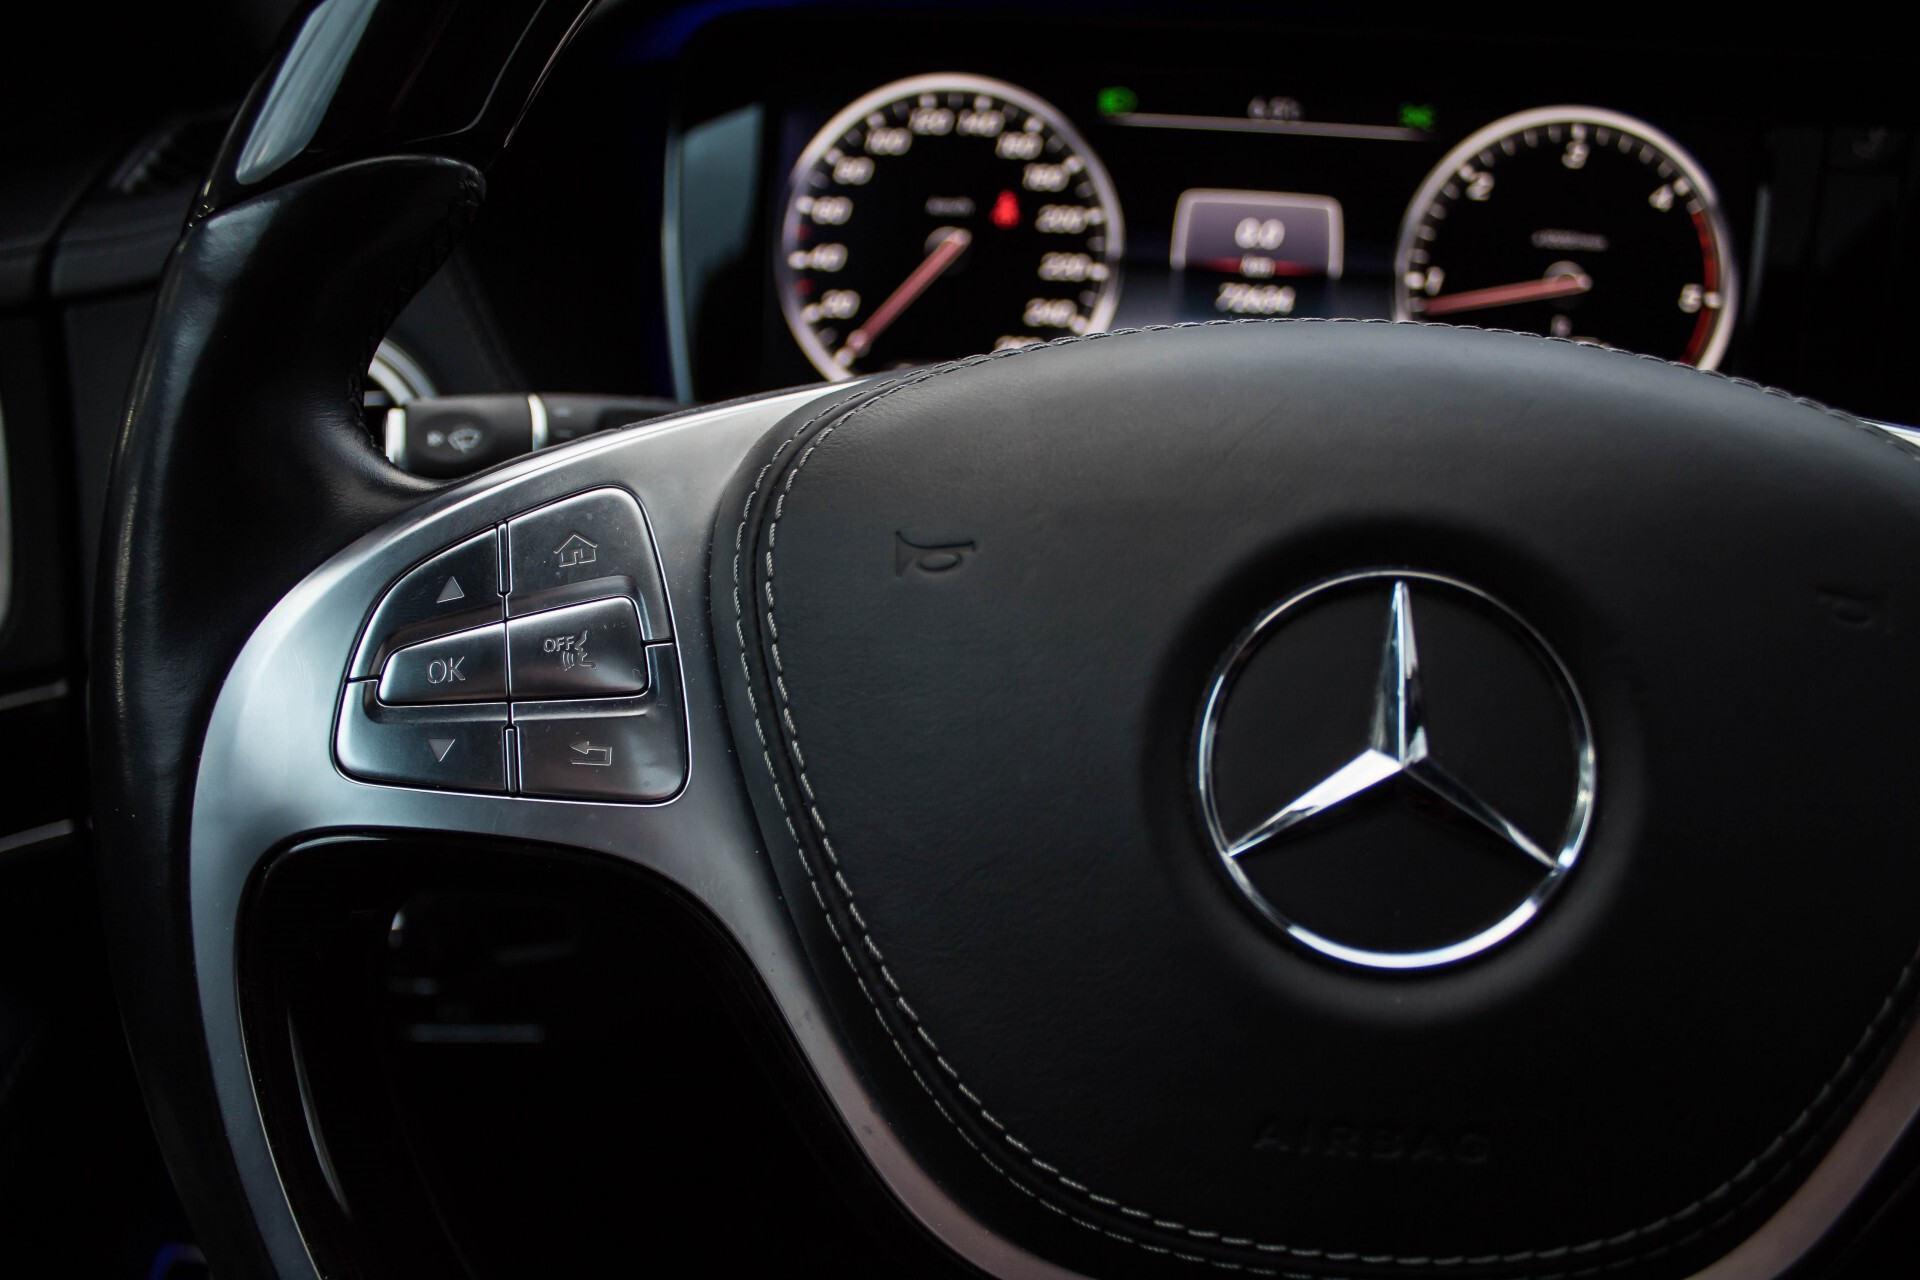 Mercedes-Benz S-Klasse 350 BlueTEC 63 AMG Panorama/Distronic/Keyless/Massage/Burmester Aut7 Foto 15